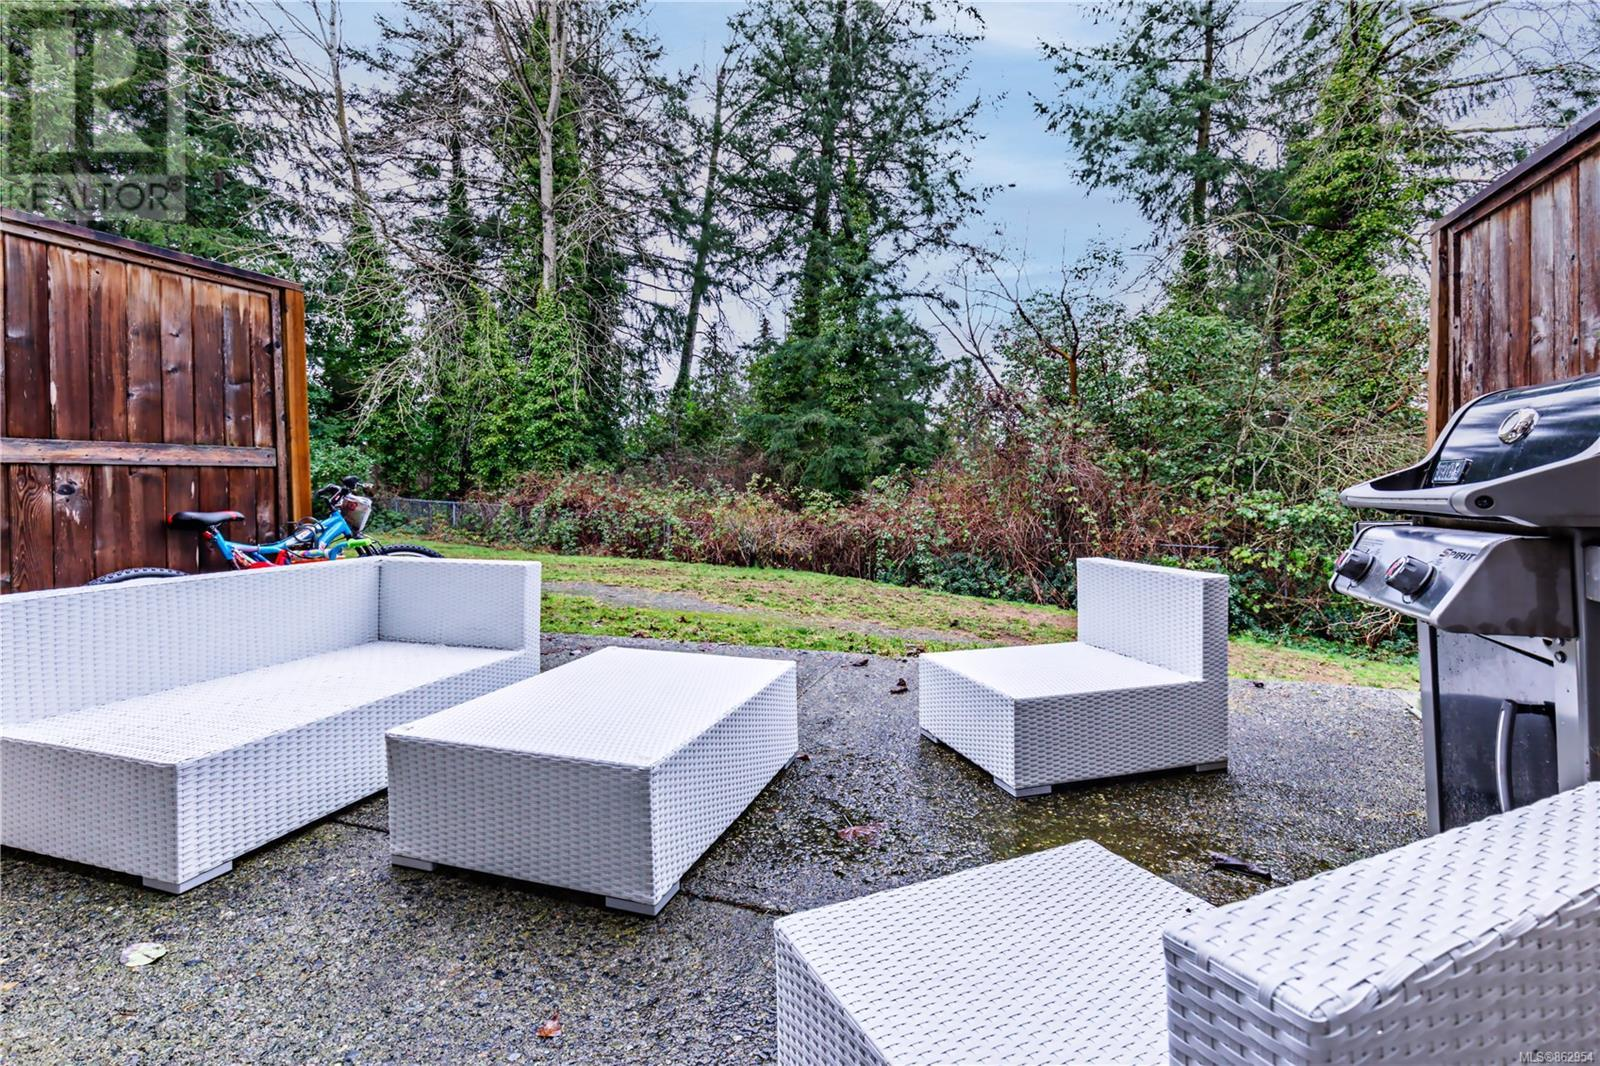 2552 Highland Blvd, Nanaimo, British Columbia  V9S 3N8 - Photo 7 - 862954